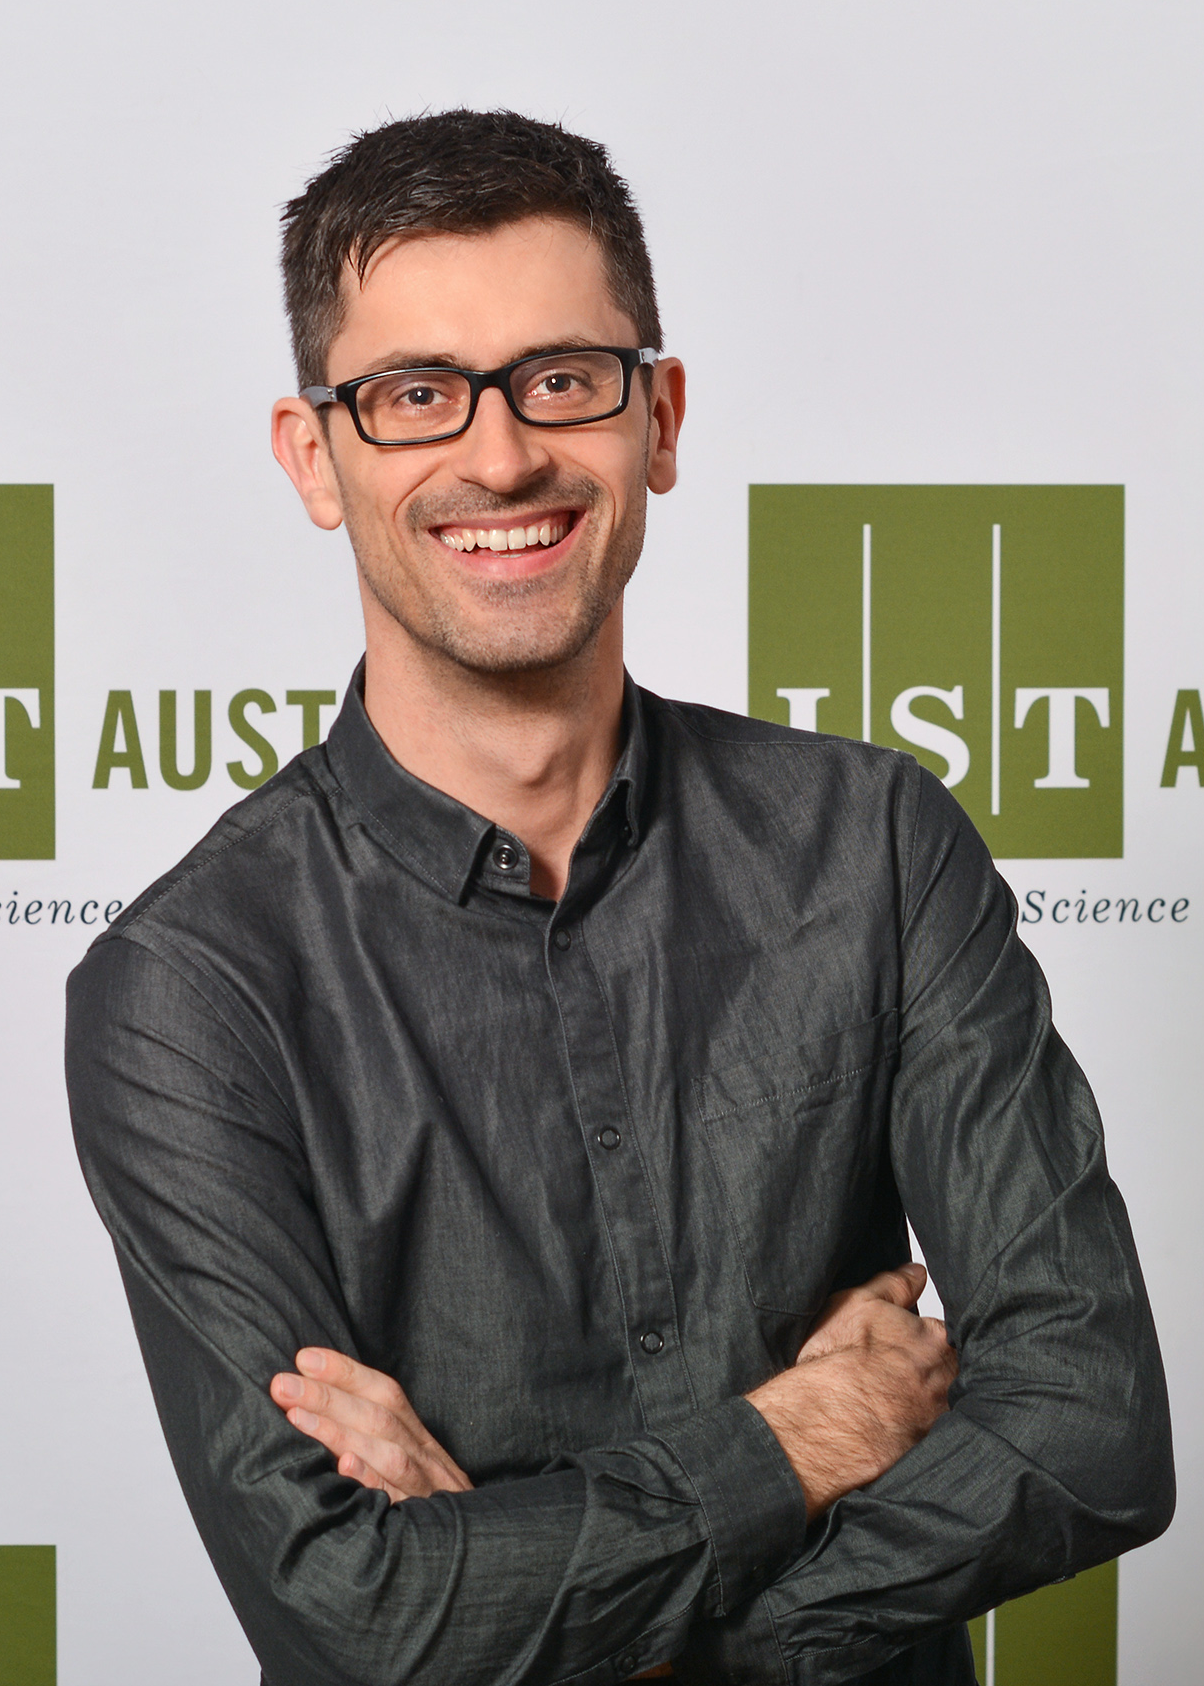 Bernd Bickel Assistant Professor, IST Austria